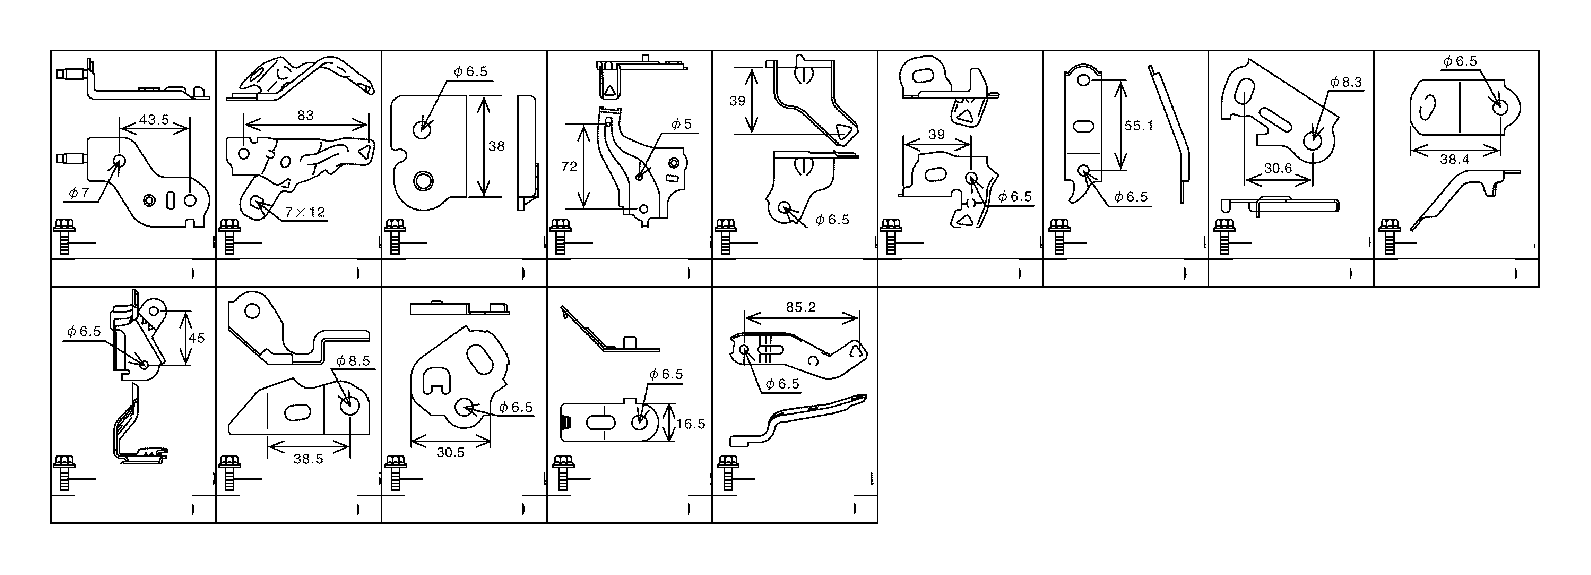 Diagram  1989 Scottsdale Wiring Harness Diagram Full